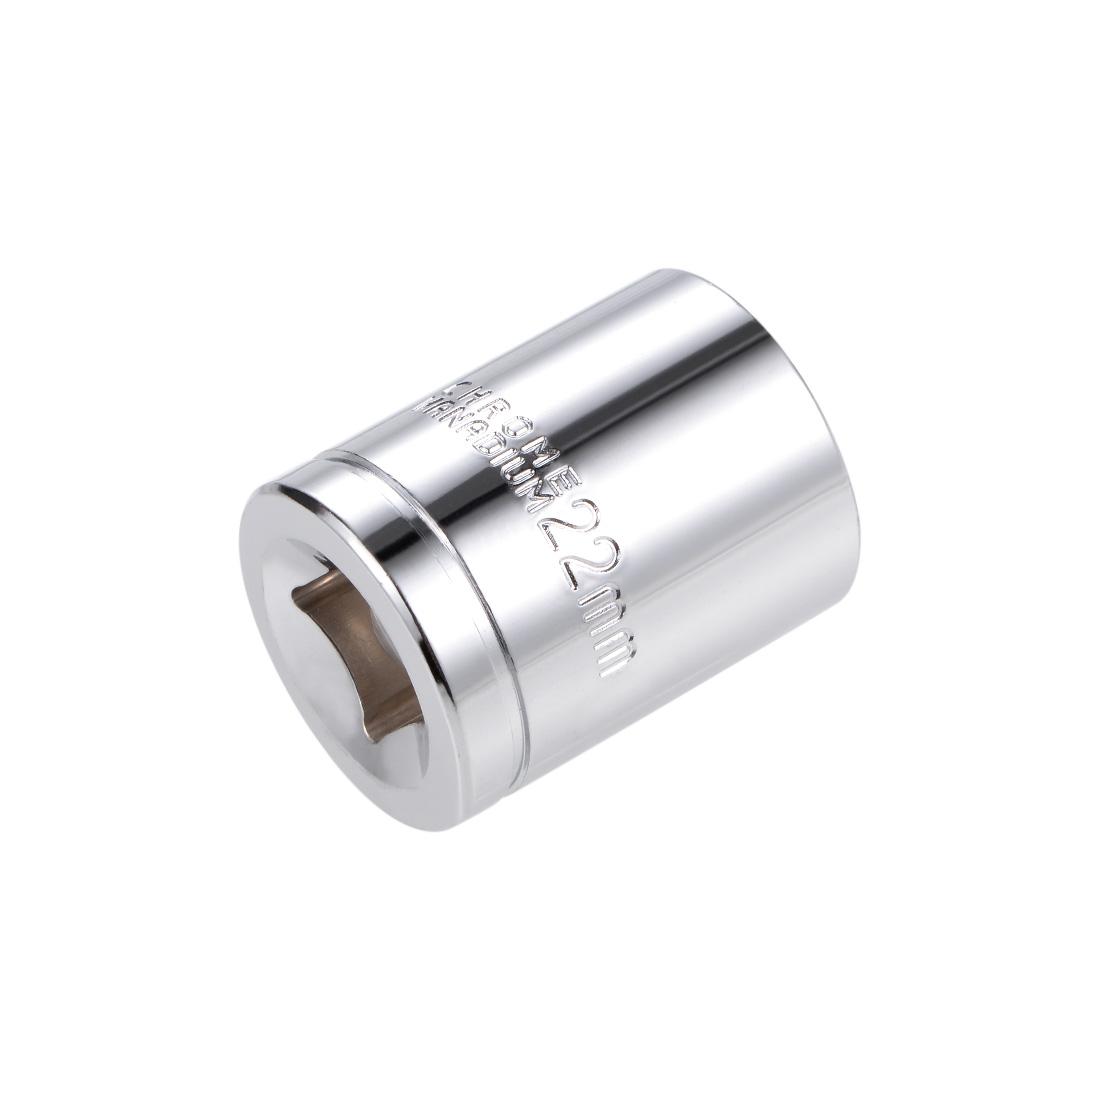 1/2-inch Drive E22 Universal Spline Socket Shallow 12 Point Cr-V Steel